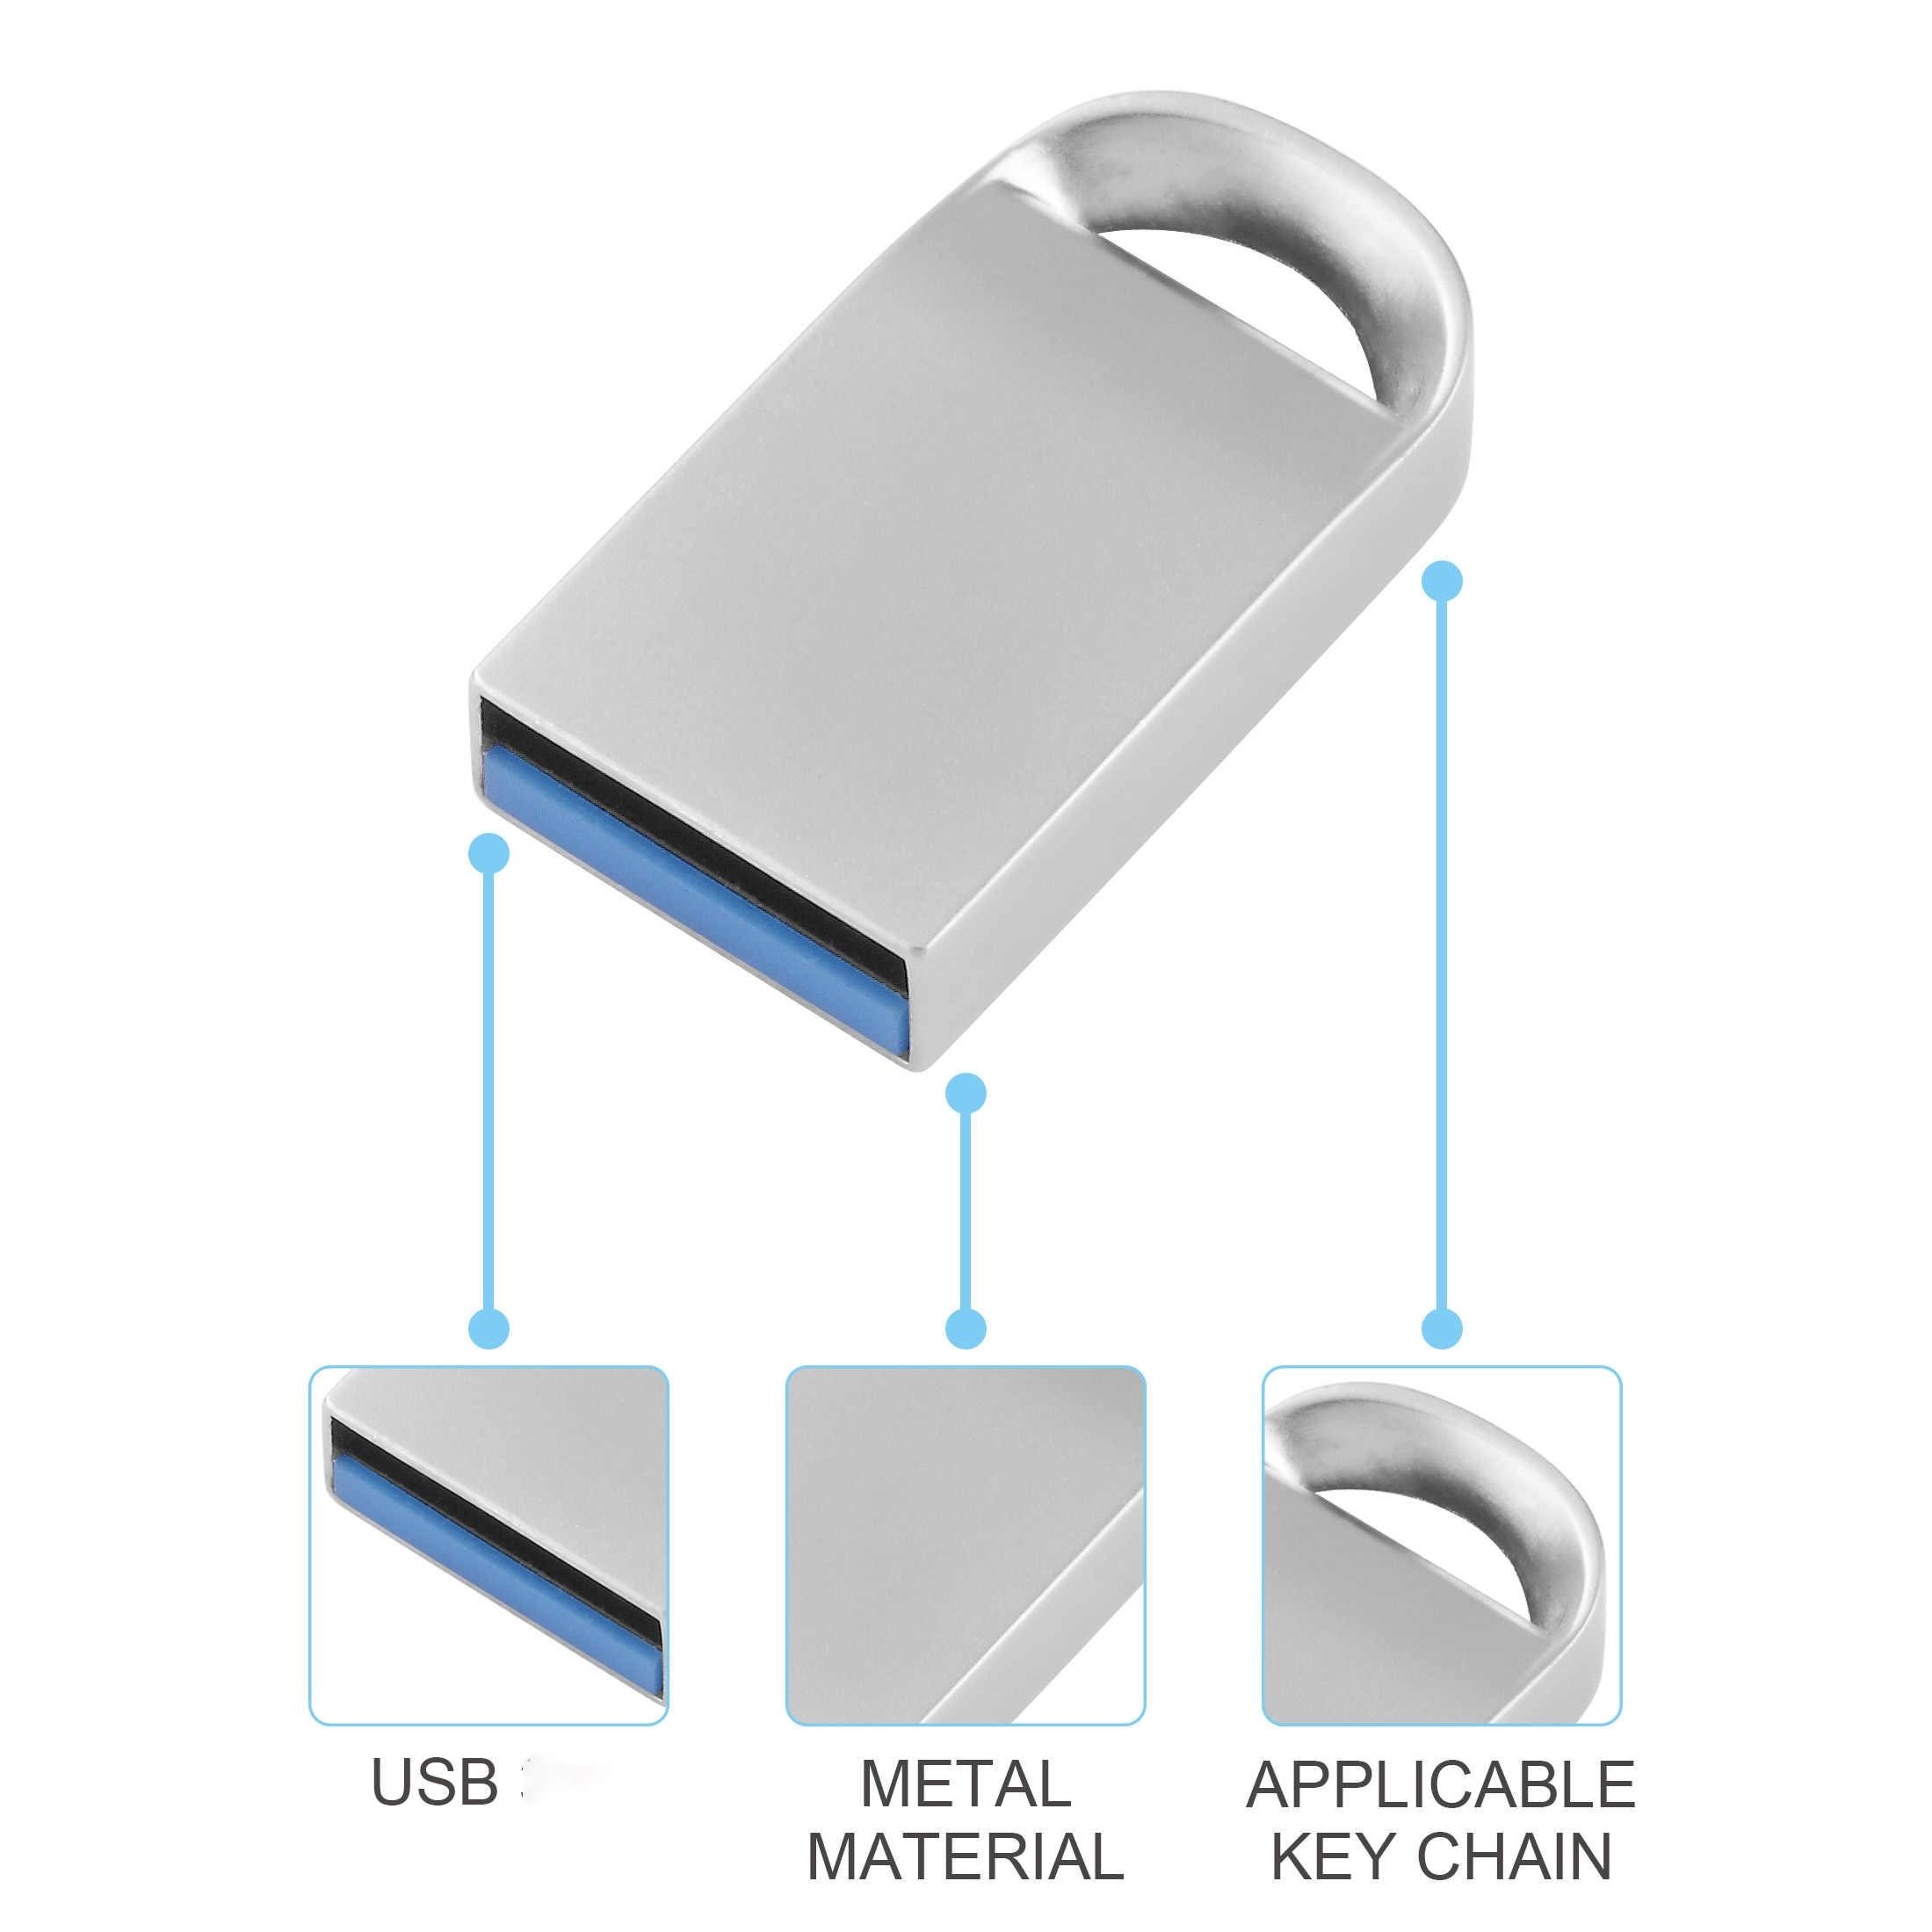 Hoge Snelheid Pen Drive 64Gb Pendrive 128Gb Usb Flash Drive 32Gb Cle Usb Memory 16Gb Flash usb Stick En Gratis Micro Type-C Adapter